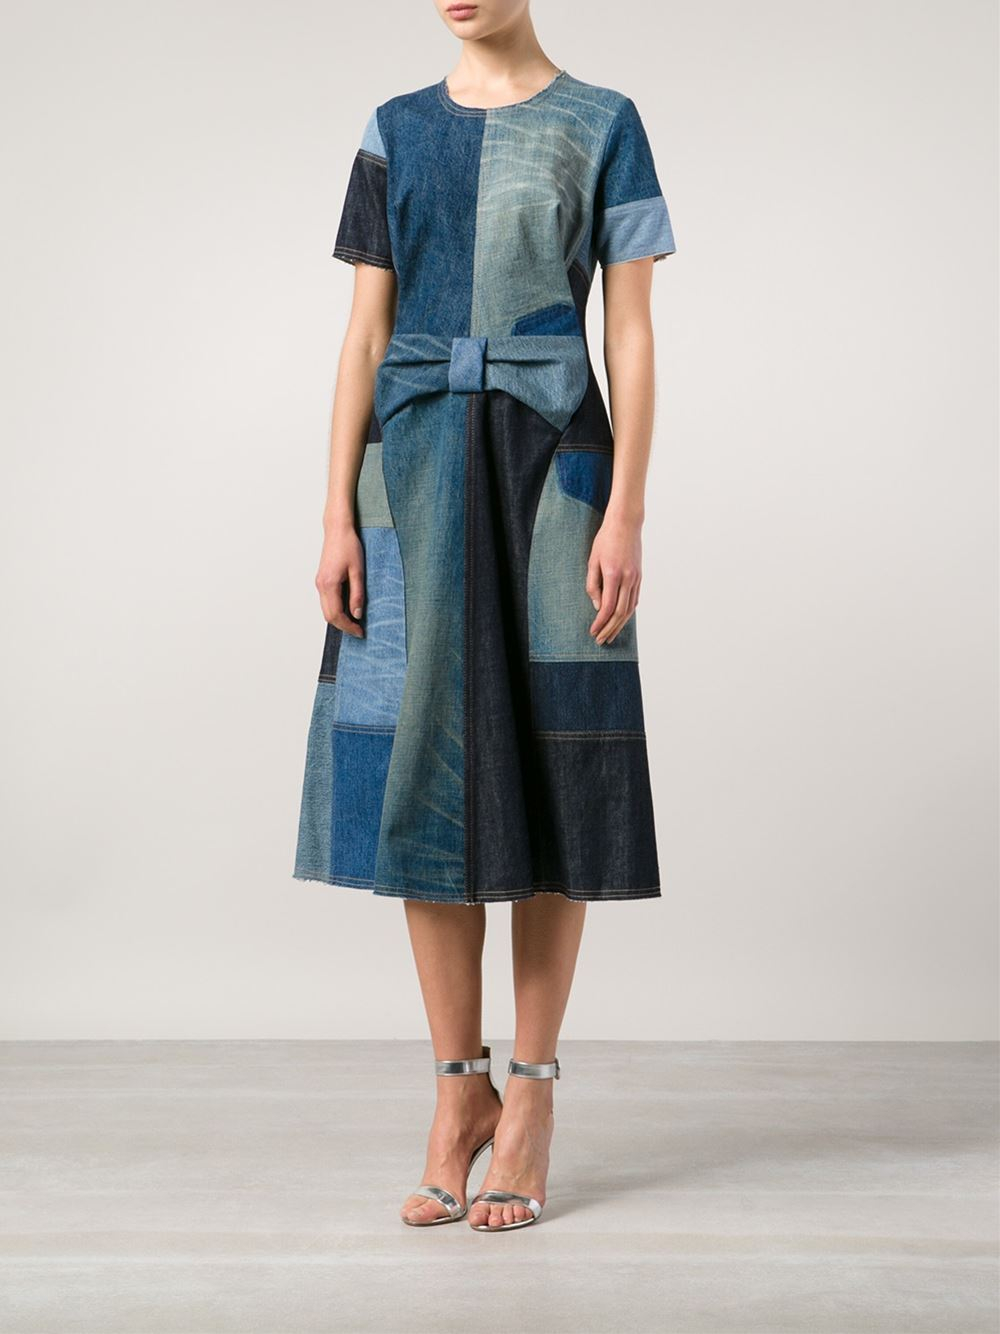 Lyst Junya Watanabe Patchwork Denim Dress In Blue